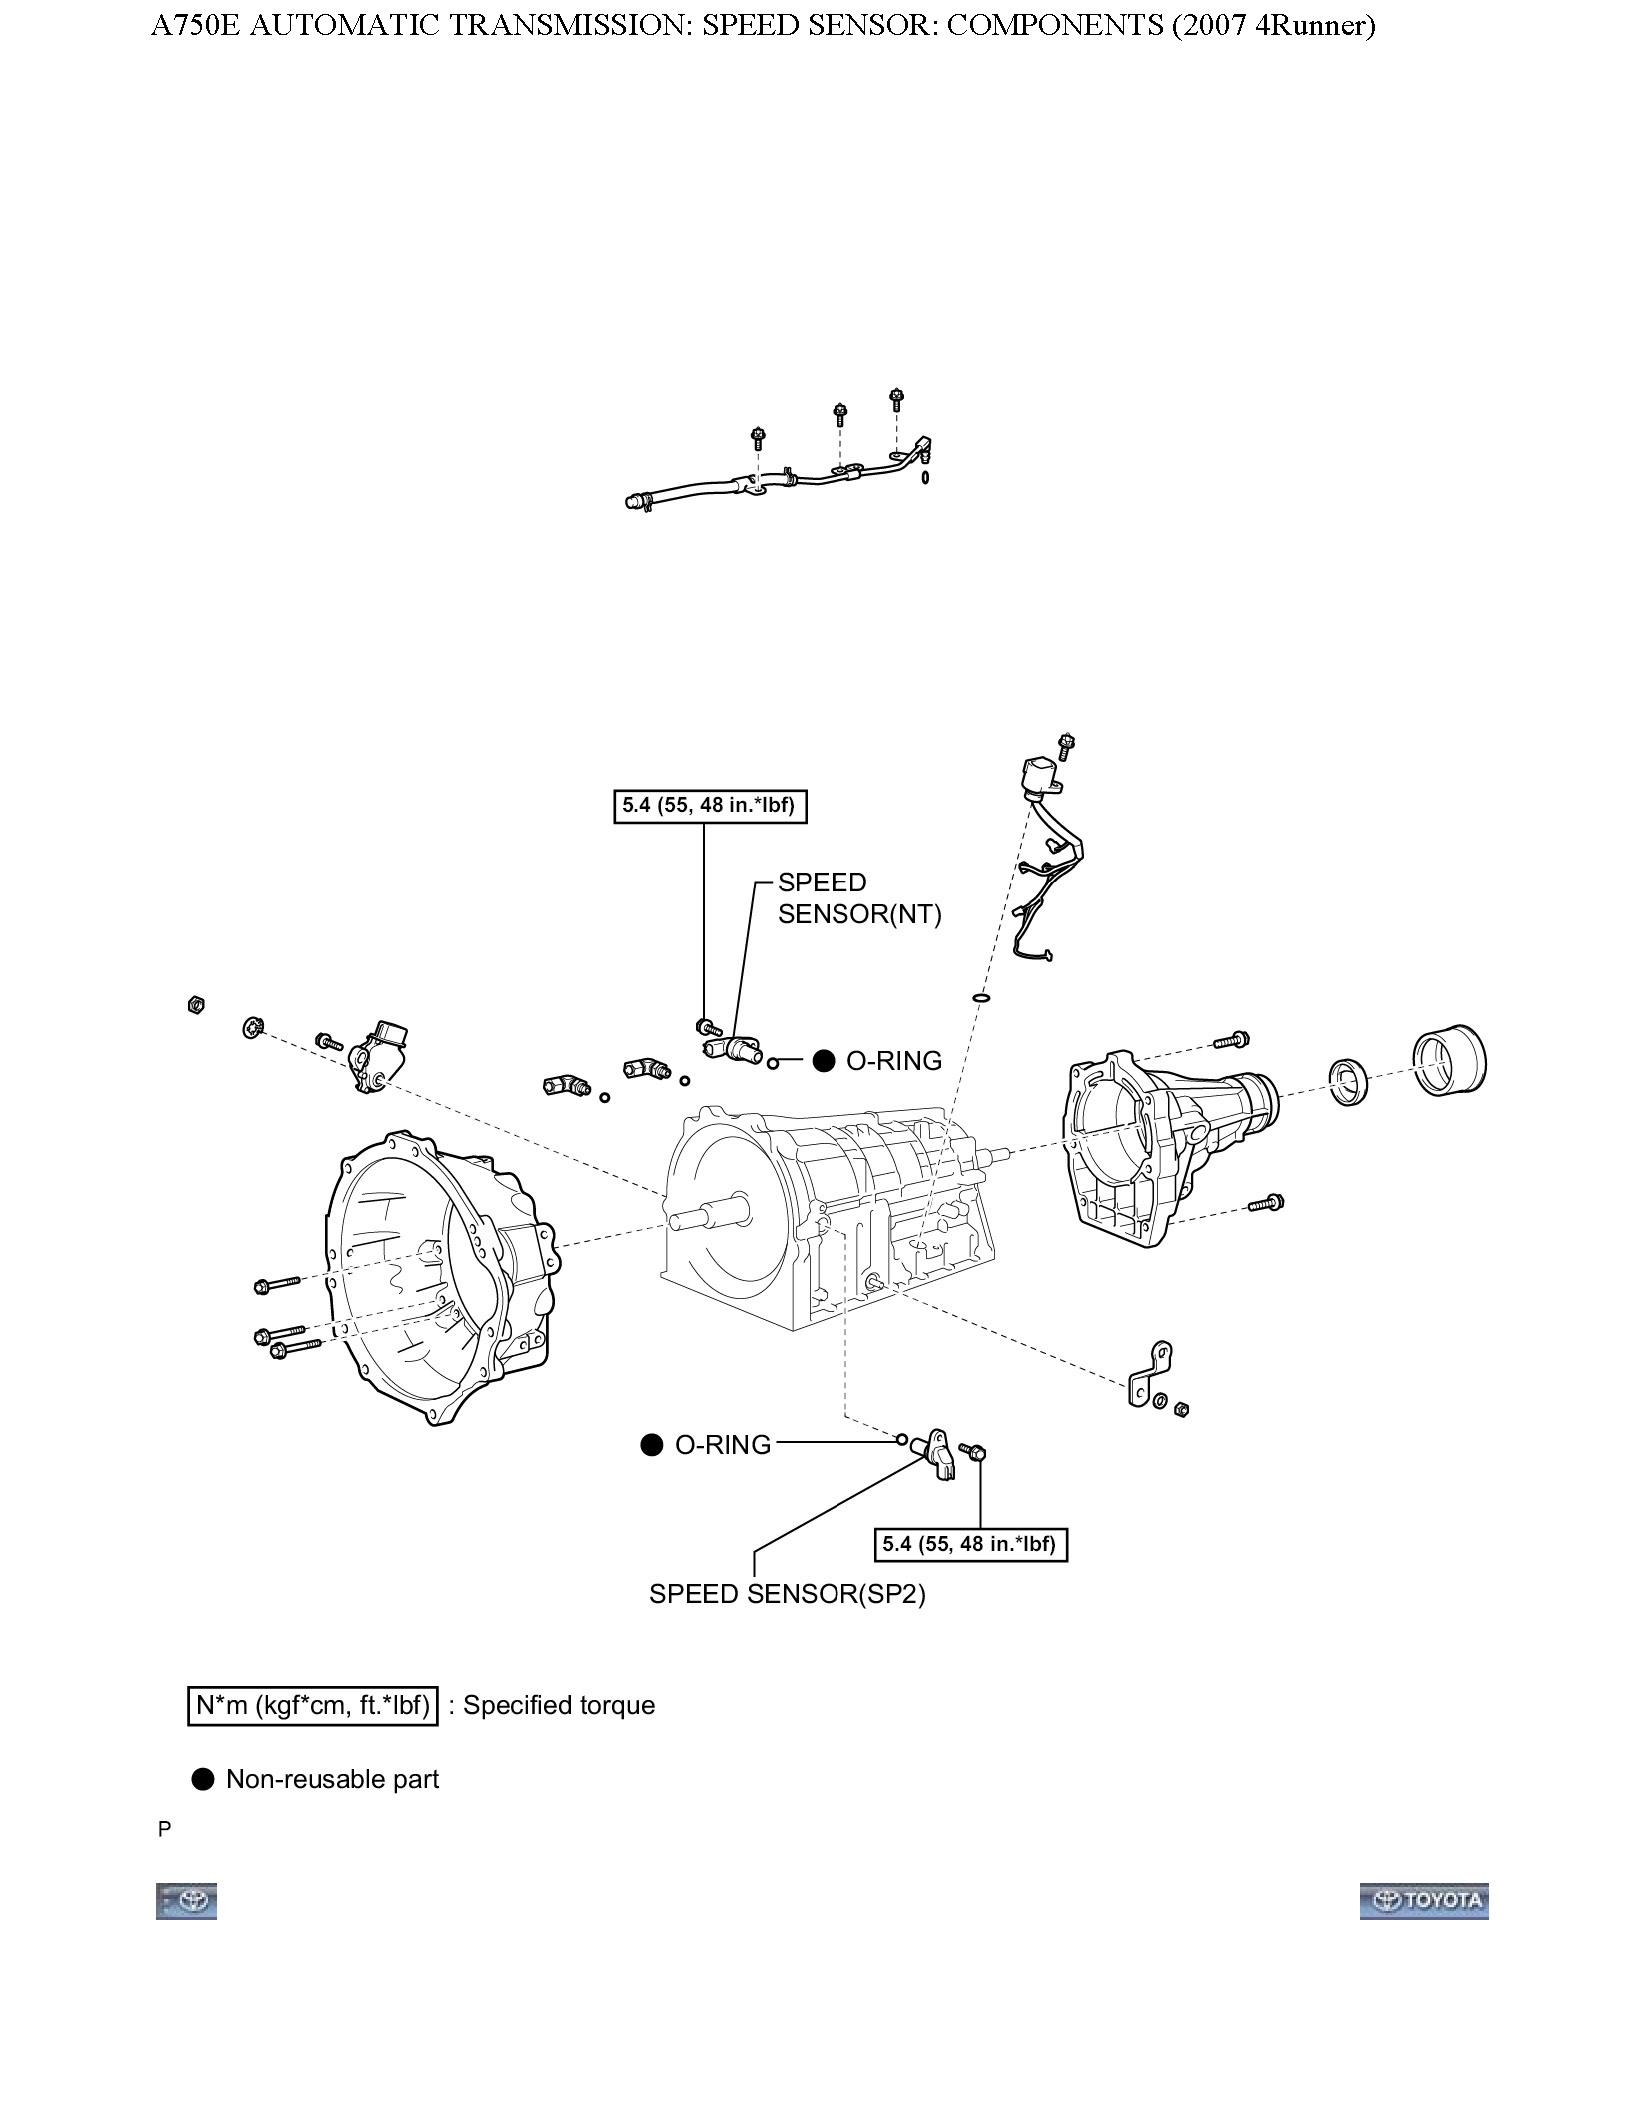 2007 Toyotum 4runner Manual Pdf